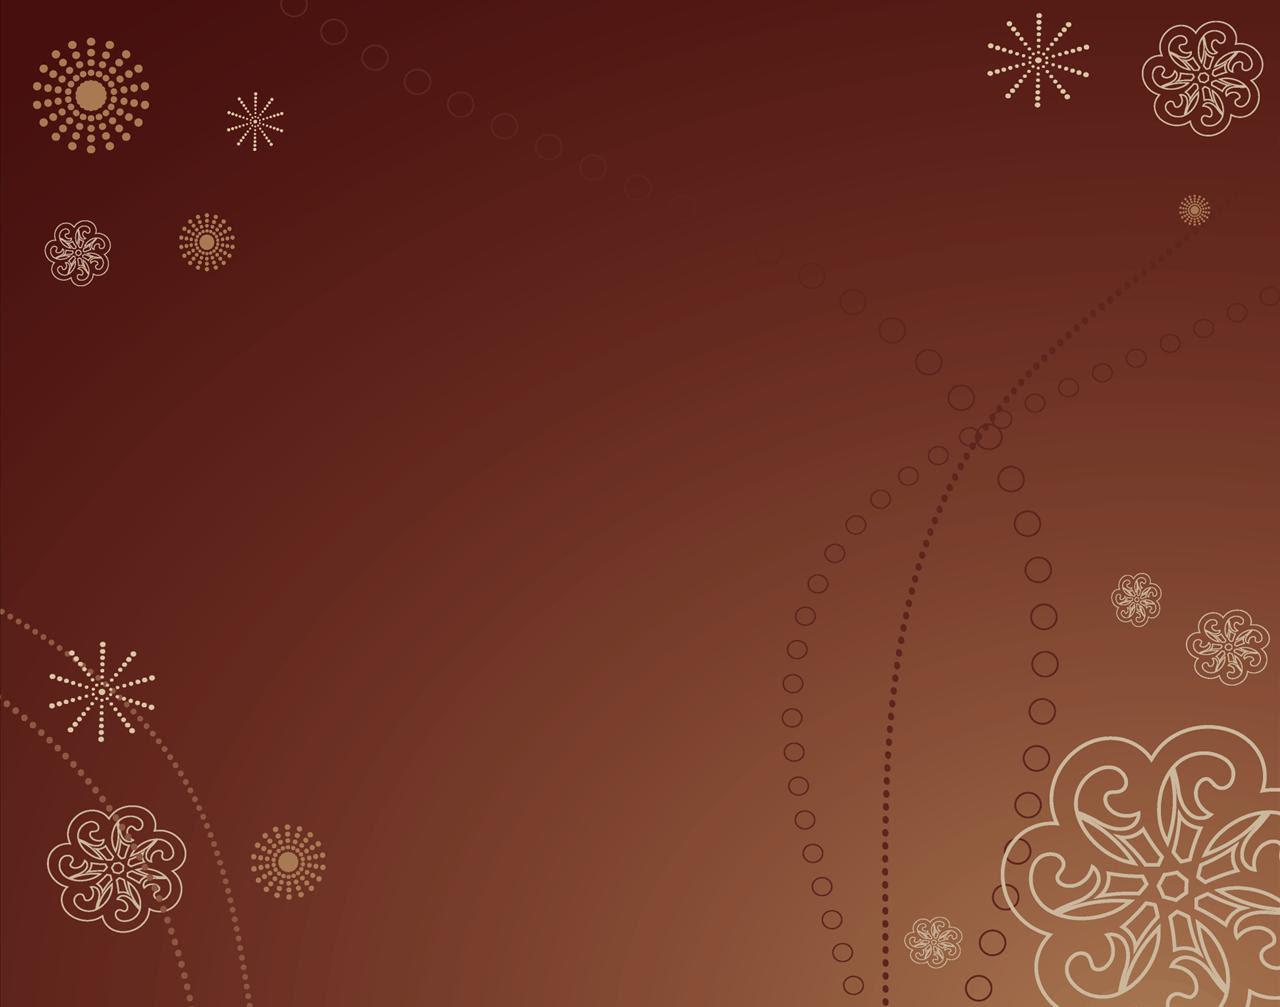 Download 108+ Background Ppt Coklat HD Terbaik